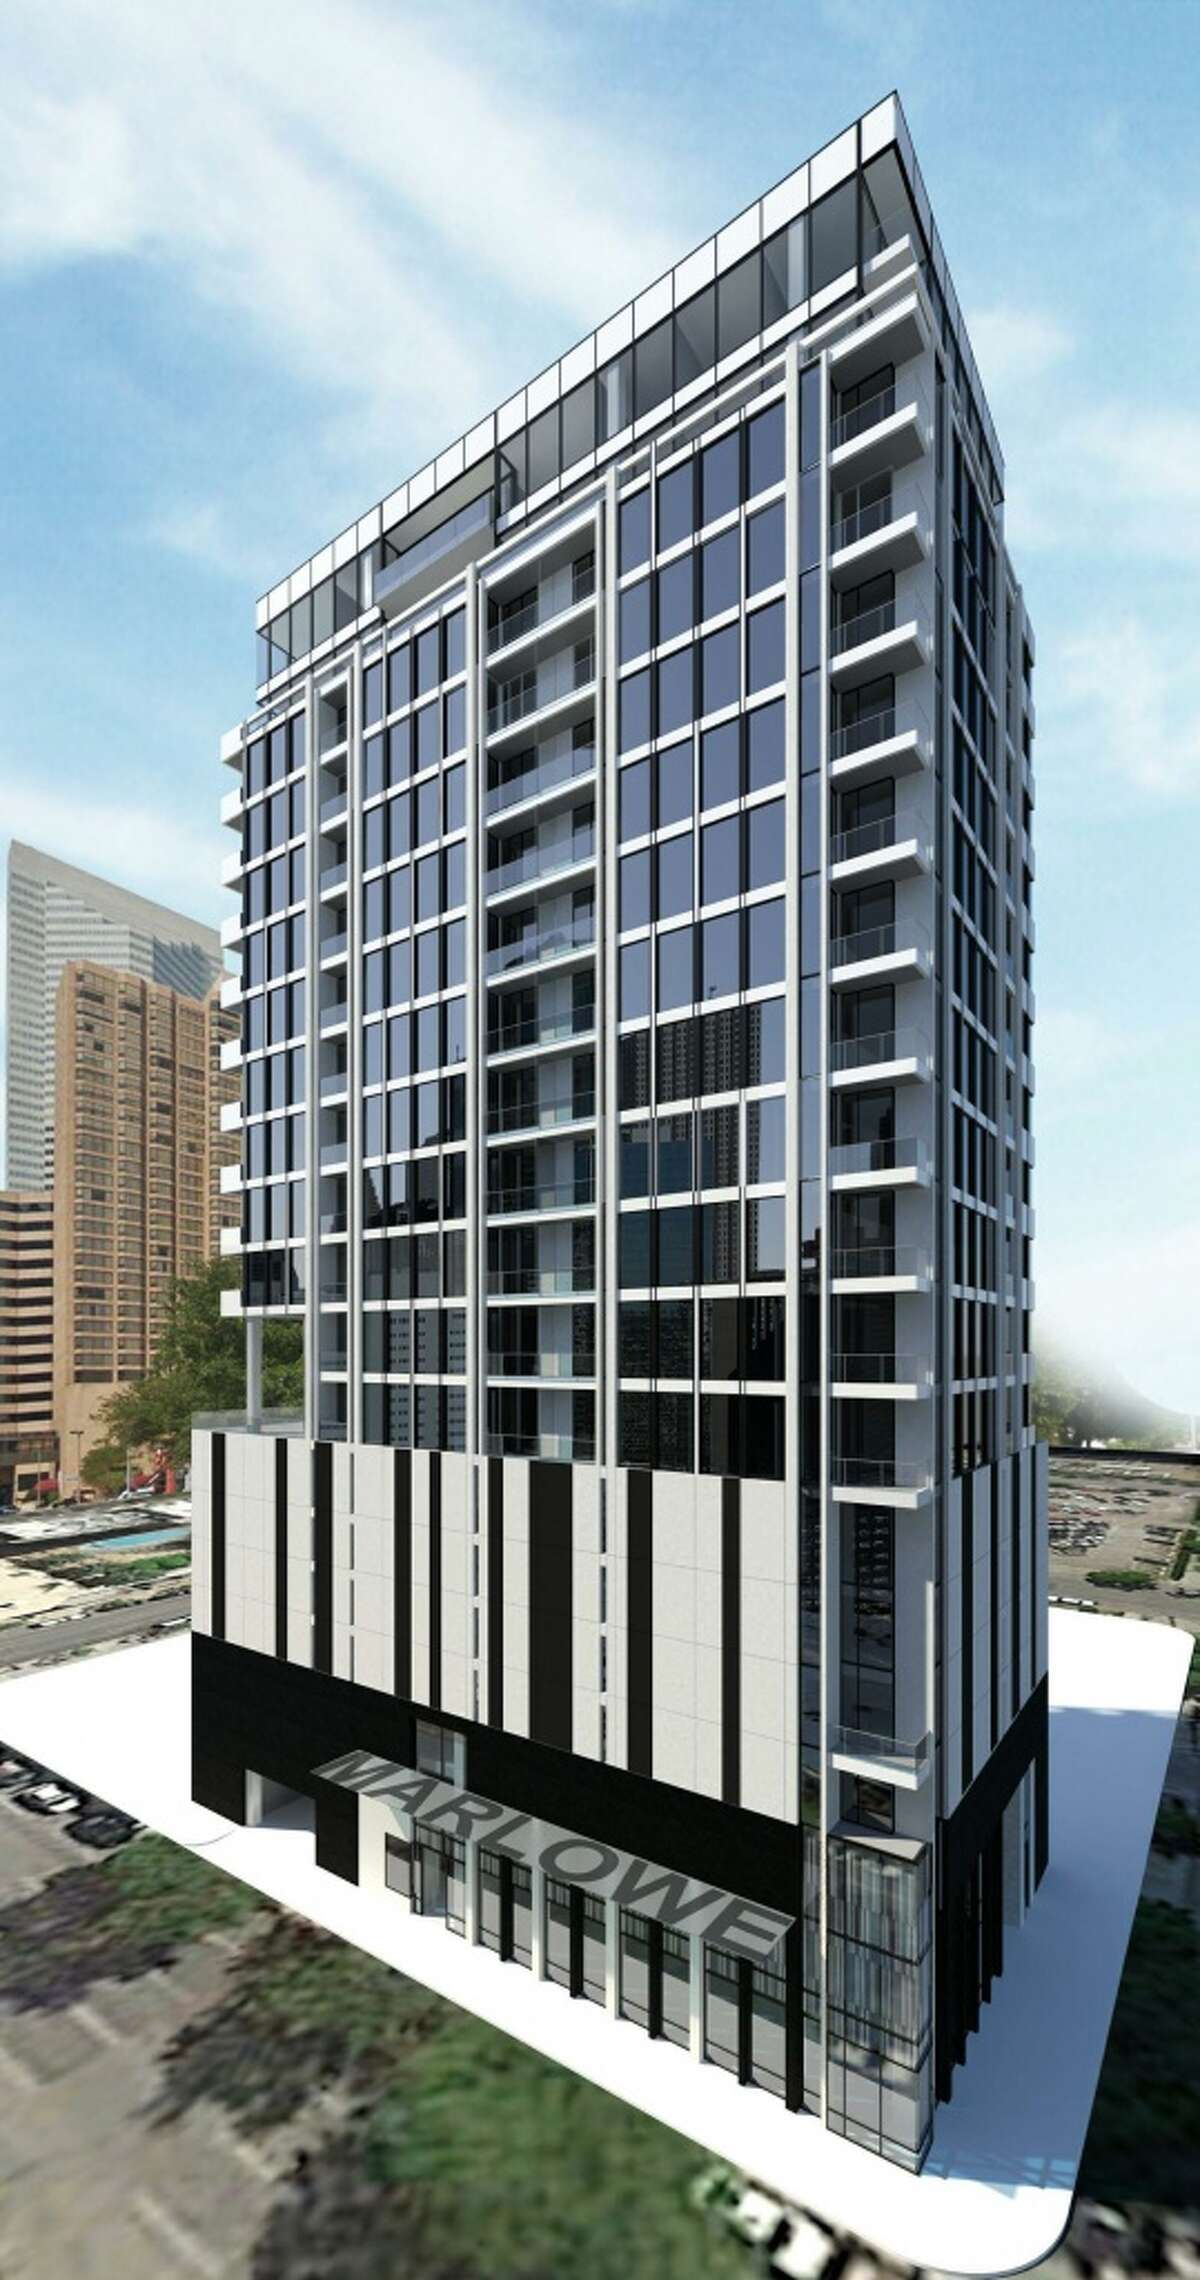 Randall Davis and Roberto Contreras are planning Marlowe, a condominium tower.